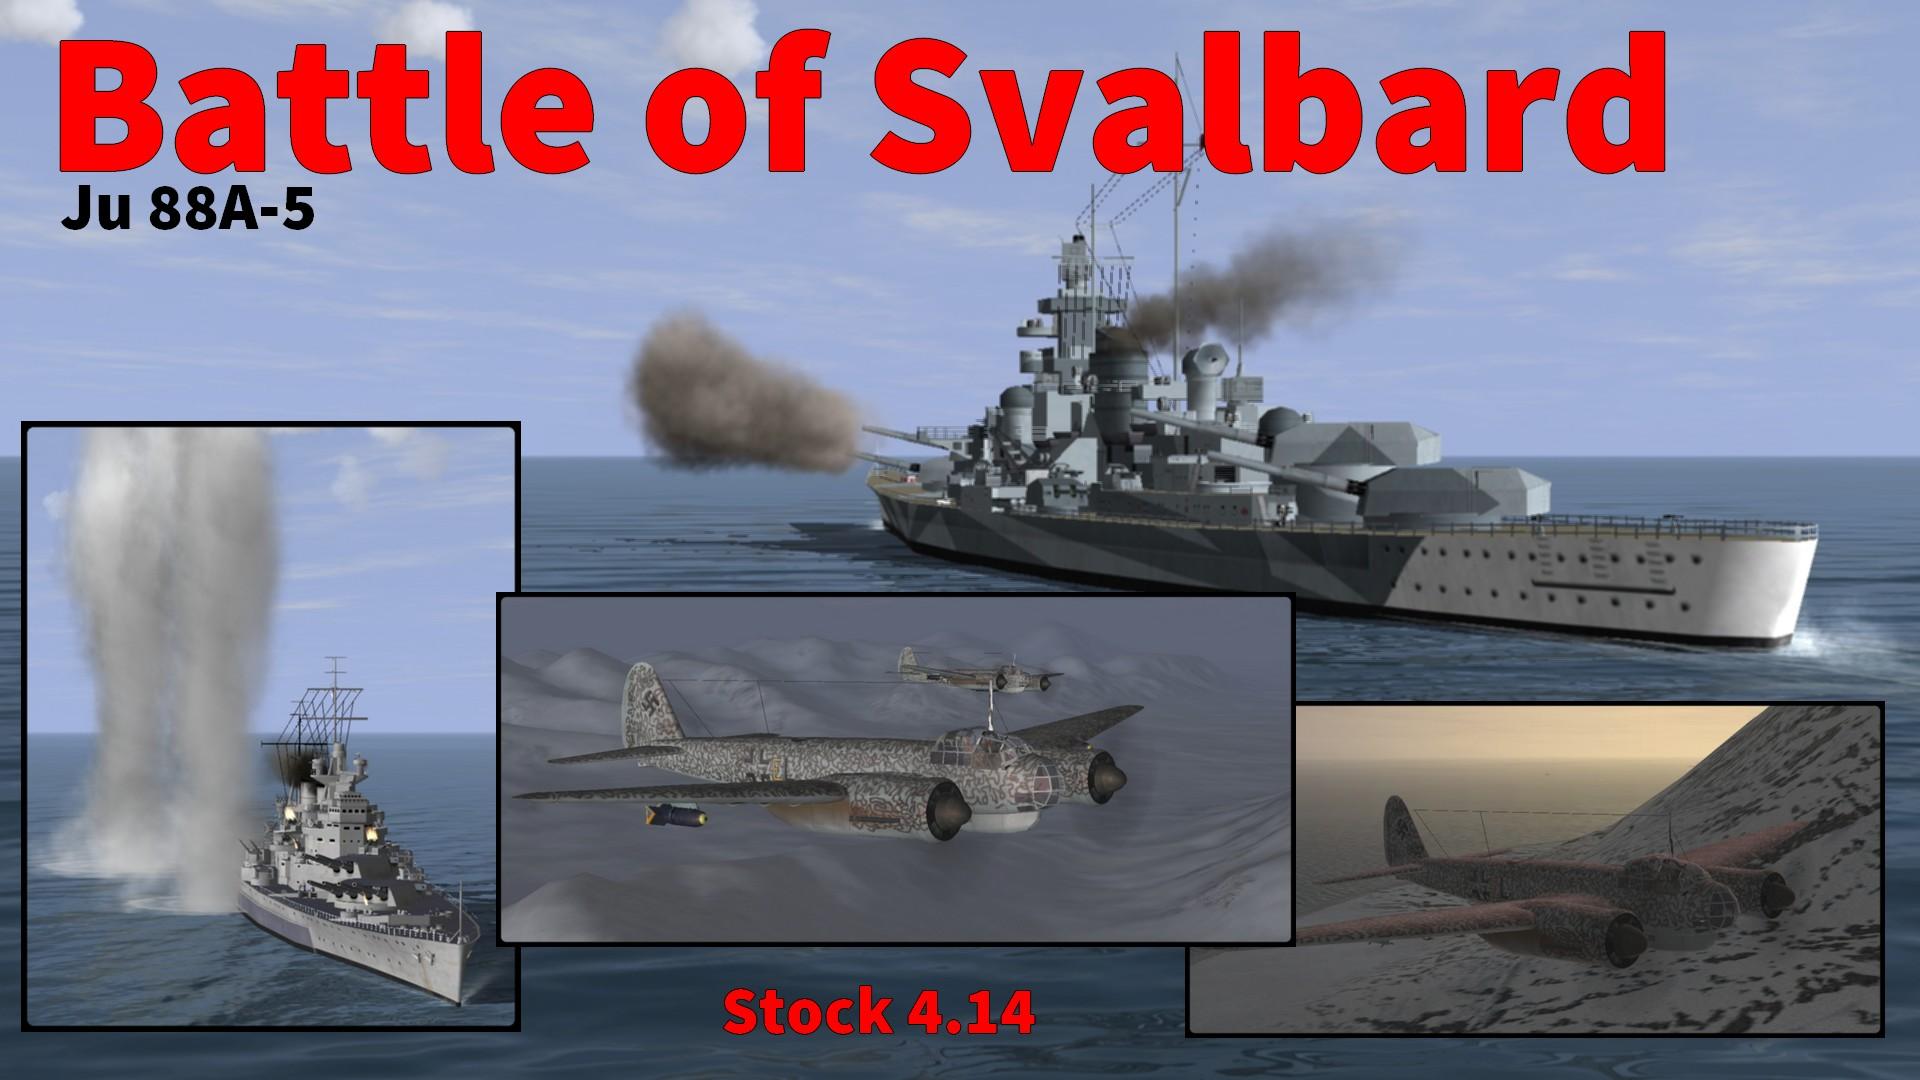 sturmovik1946.estranky.cz/img/original/2453/-2453-svalbardju88.jpg